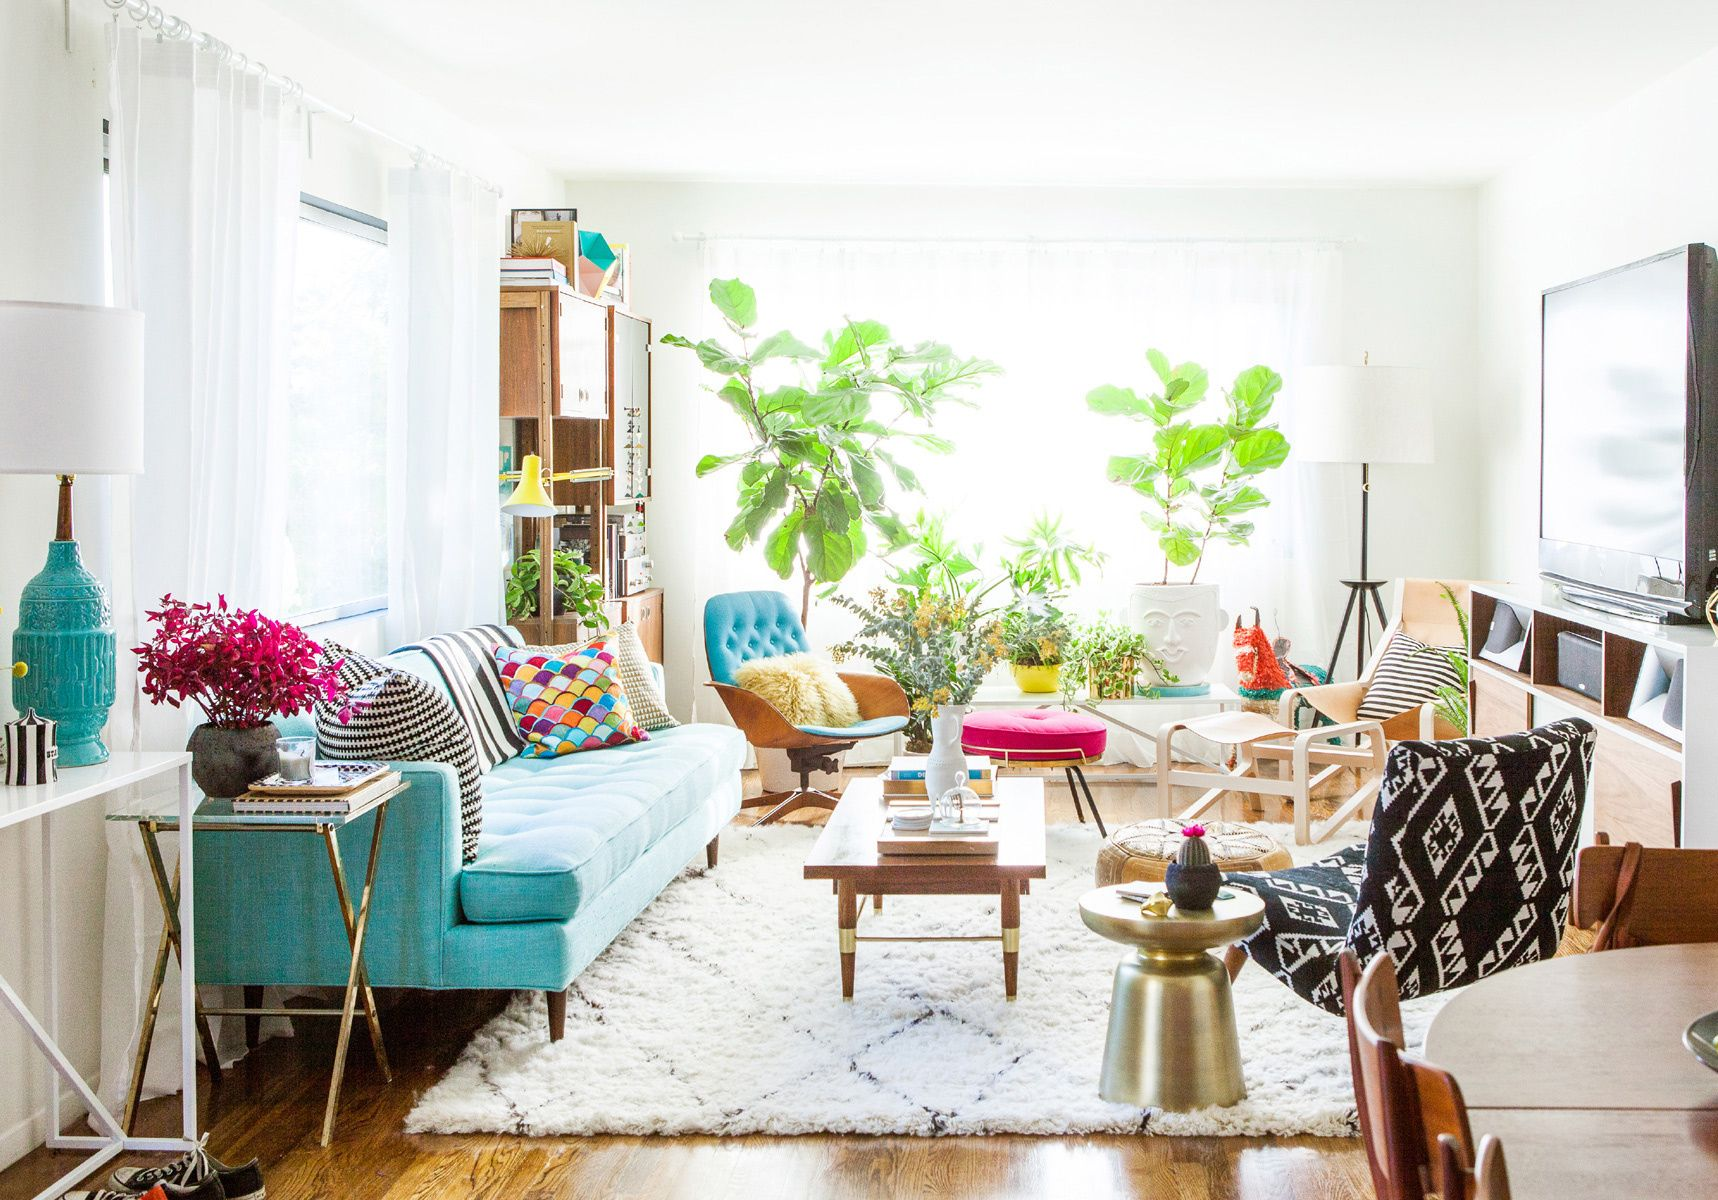 Pin von Jessica Inocencio-Gray auf HOME living room | Pinterest